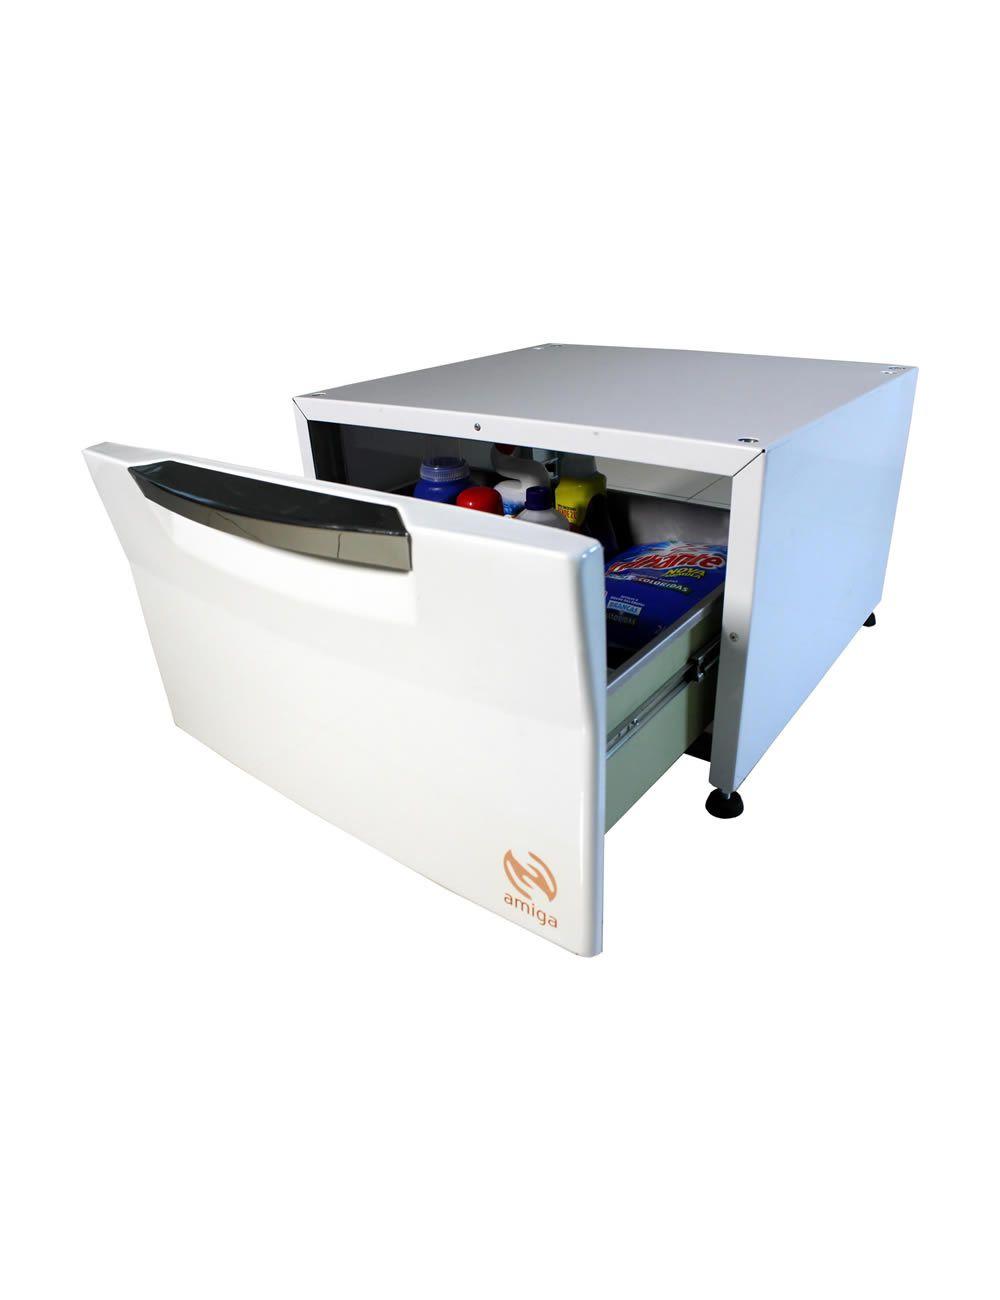 Pedestal Organizador Sempre Amiga Cor Branca P/Lava e Seca LG de 8,5Kg - Amiga